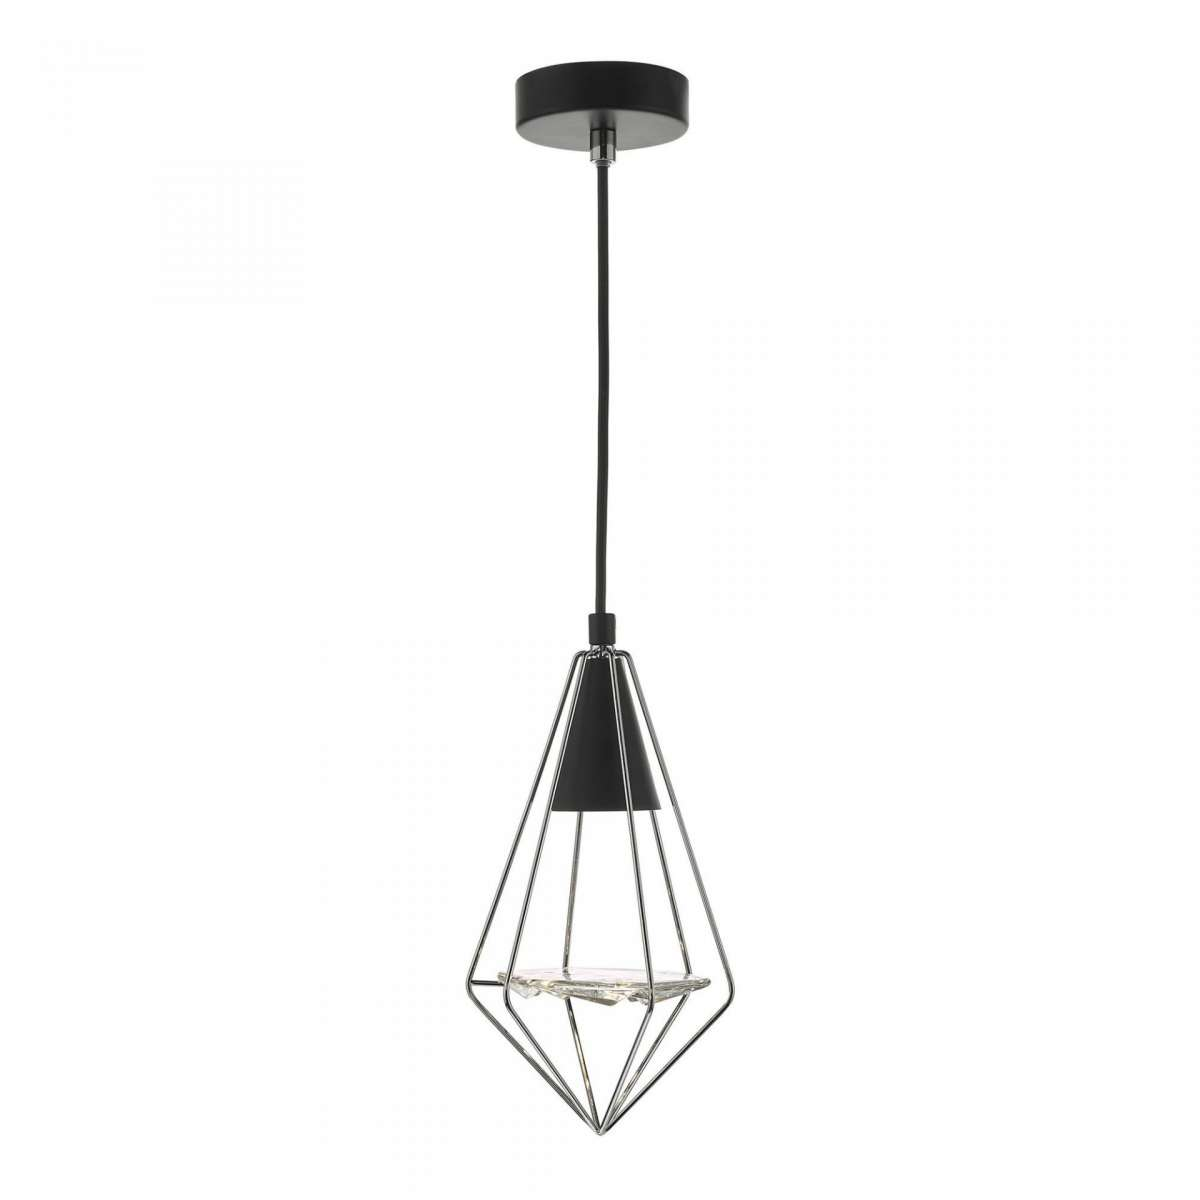 Gianni 1 Light Pendant Black, Polished Chrome & Glass